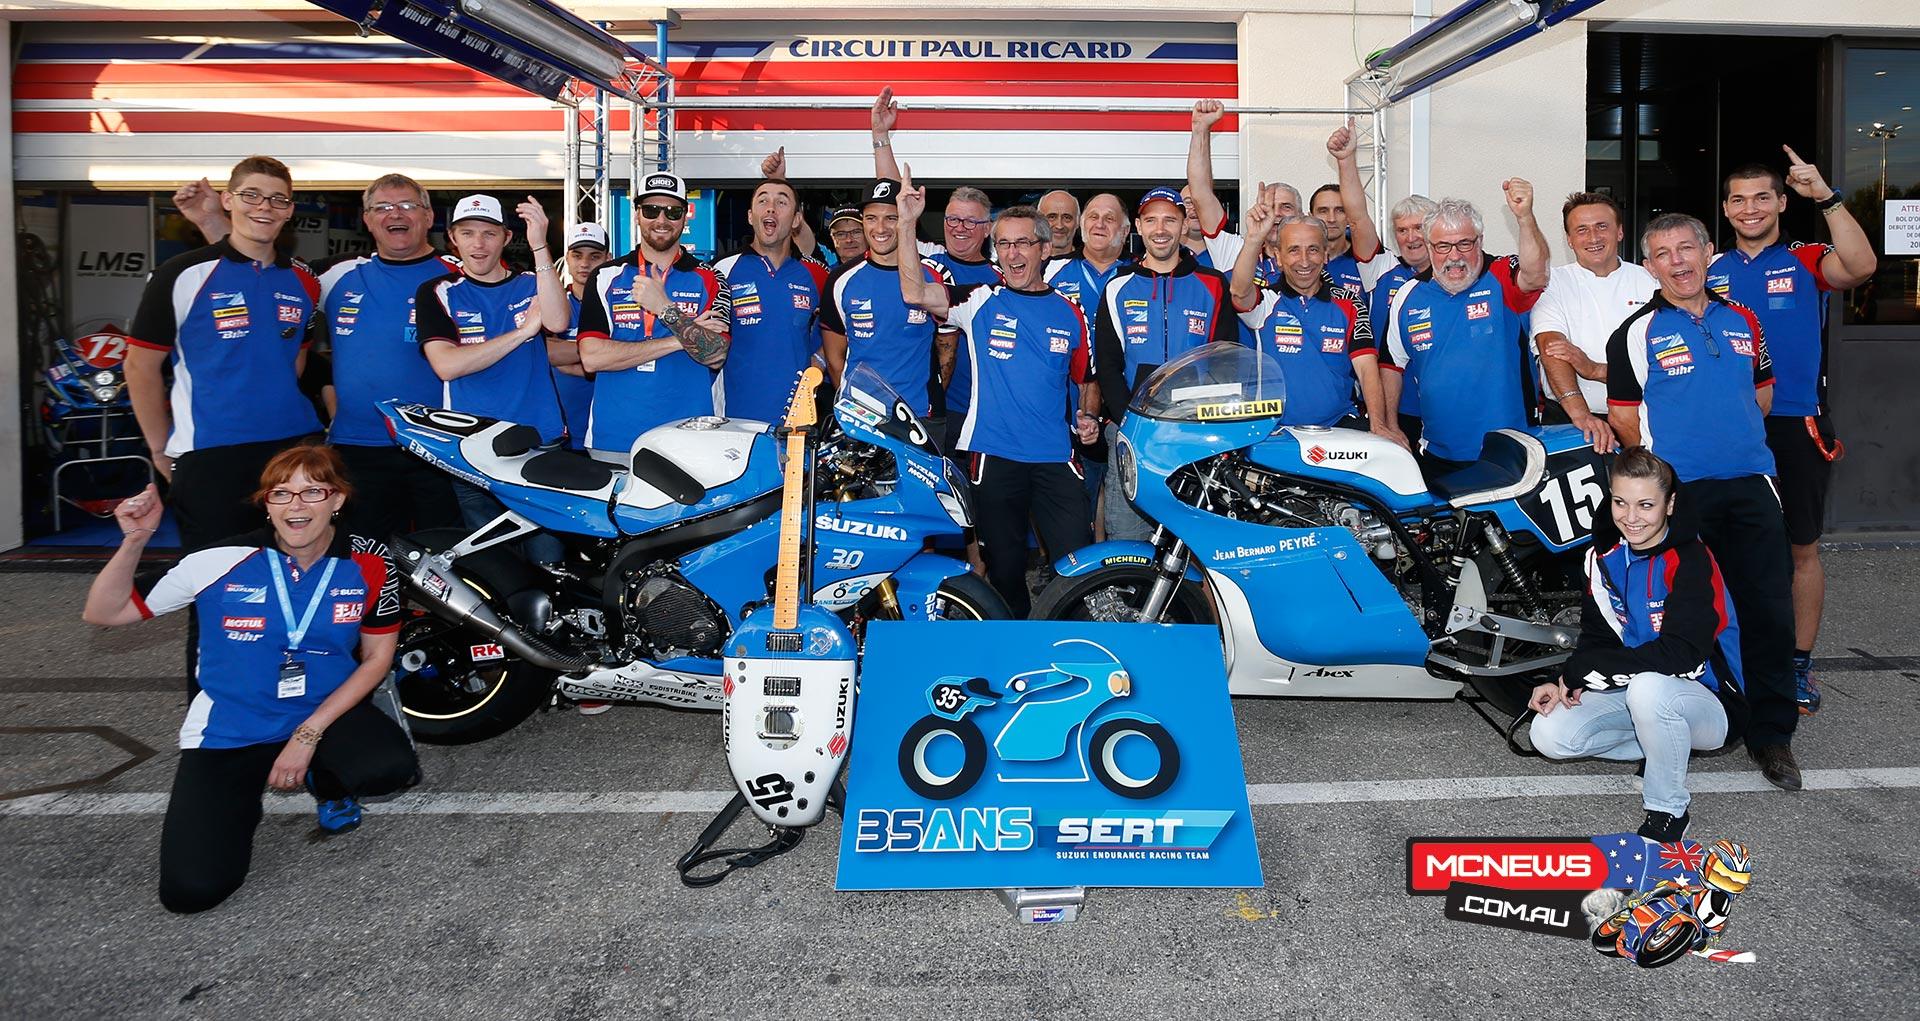 2015 Bol d'Or - Suzuki Endurance Racing Team (SERT) - World Endurance Champions 2015